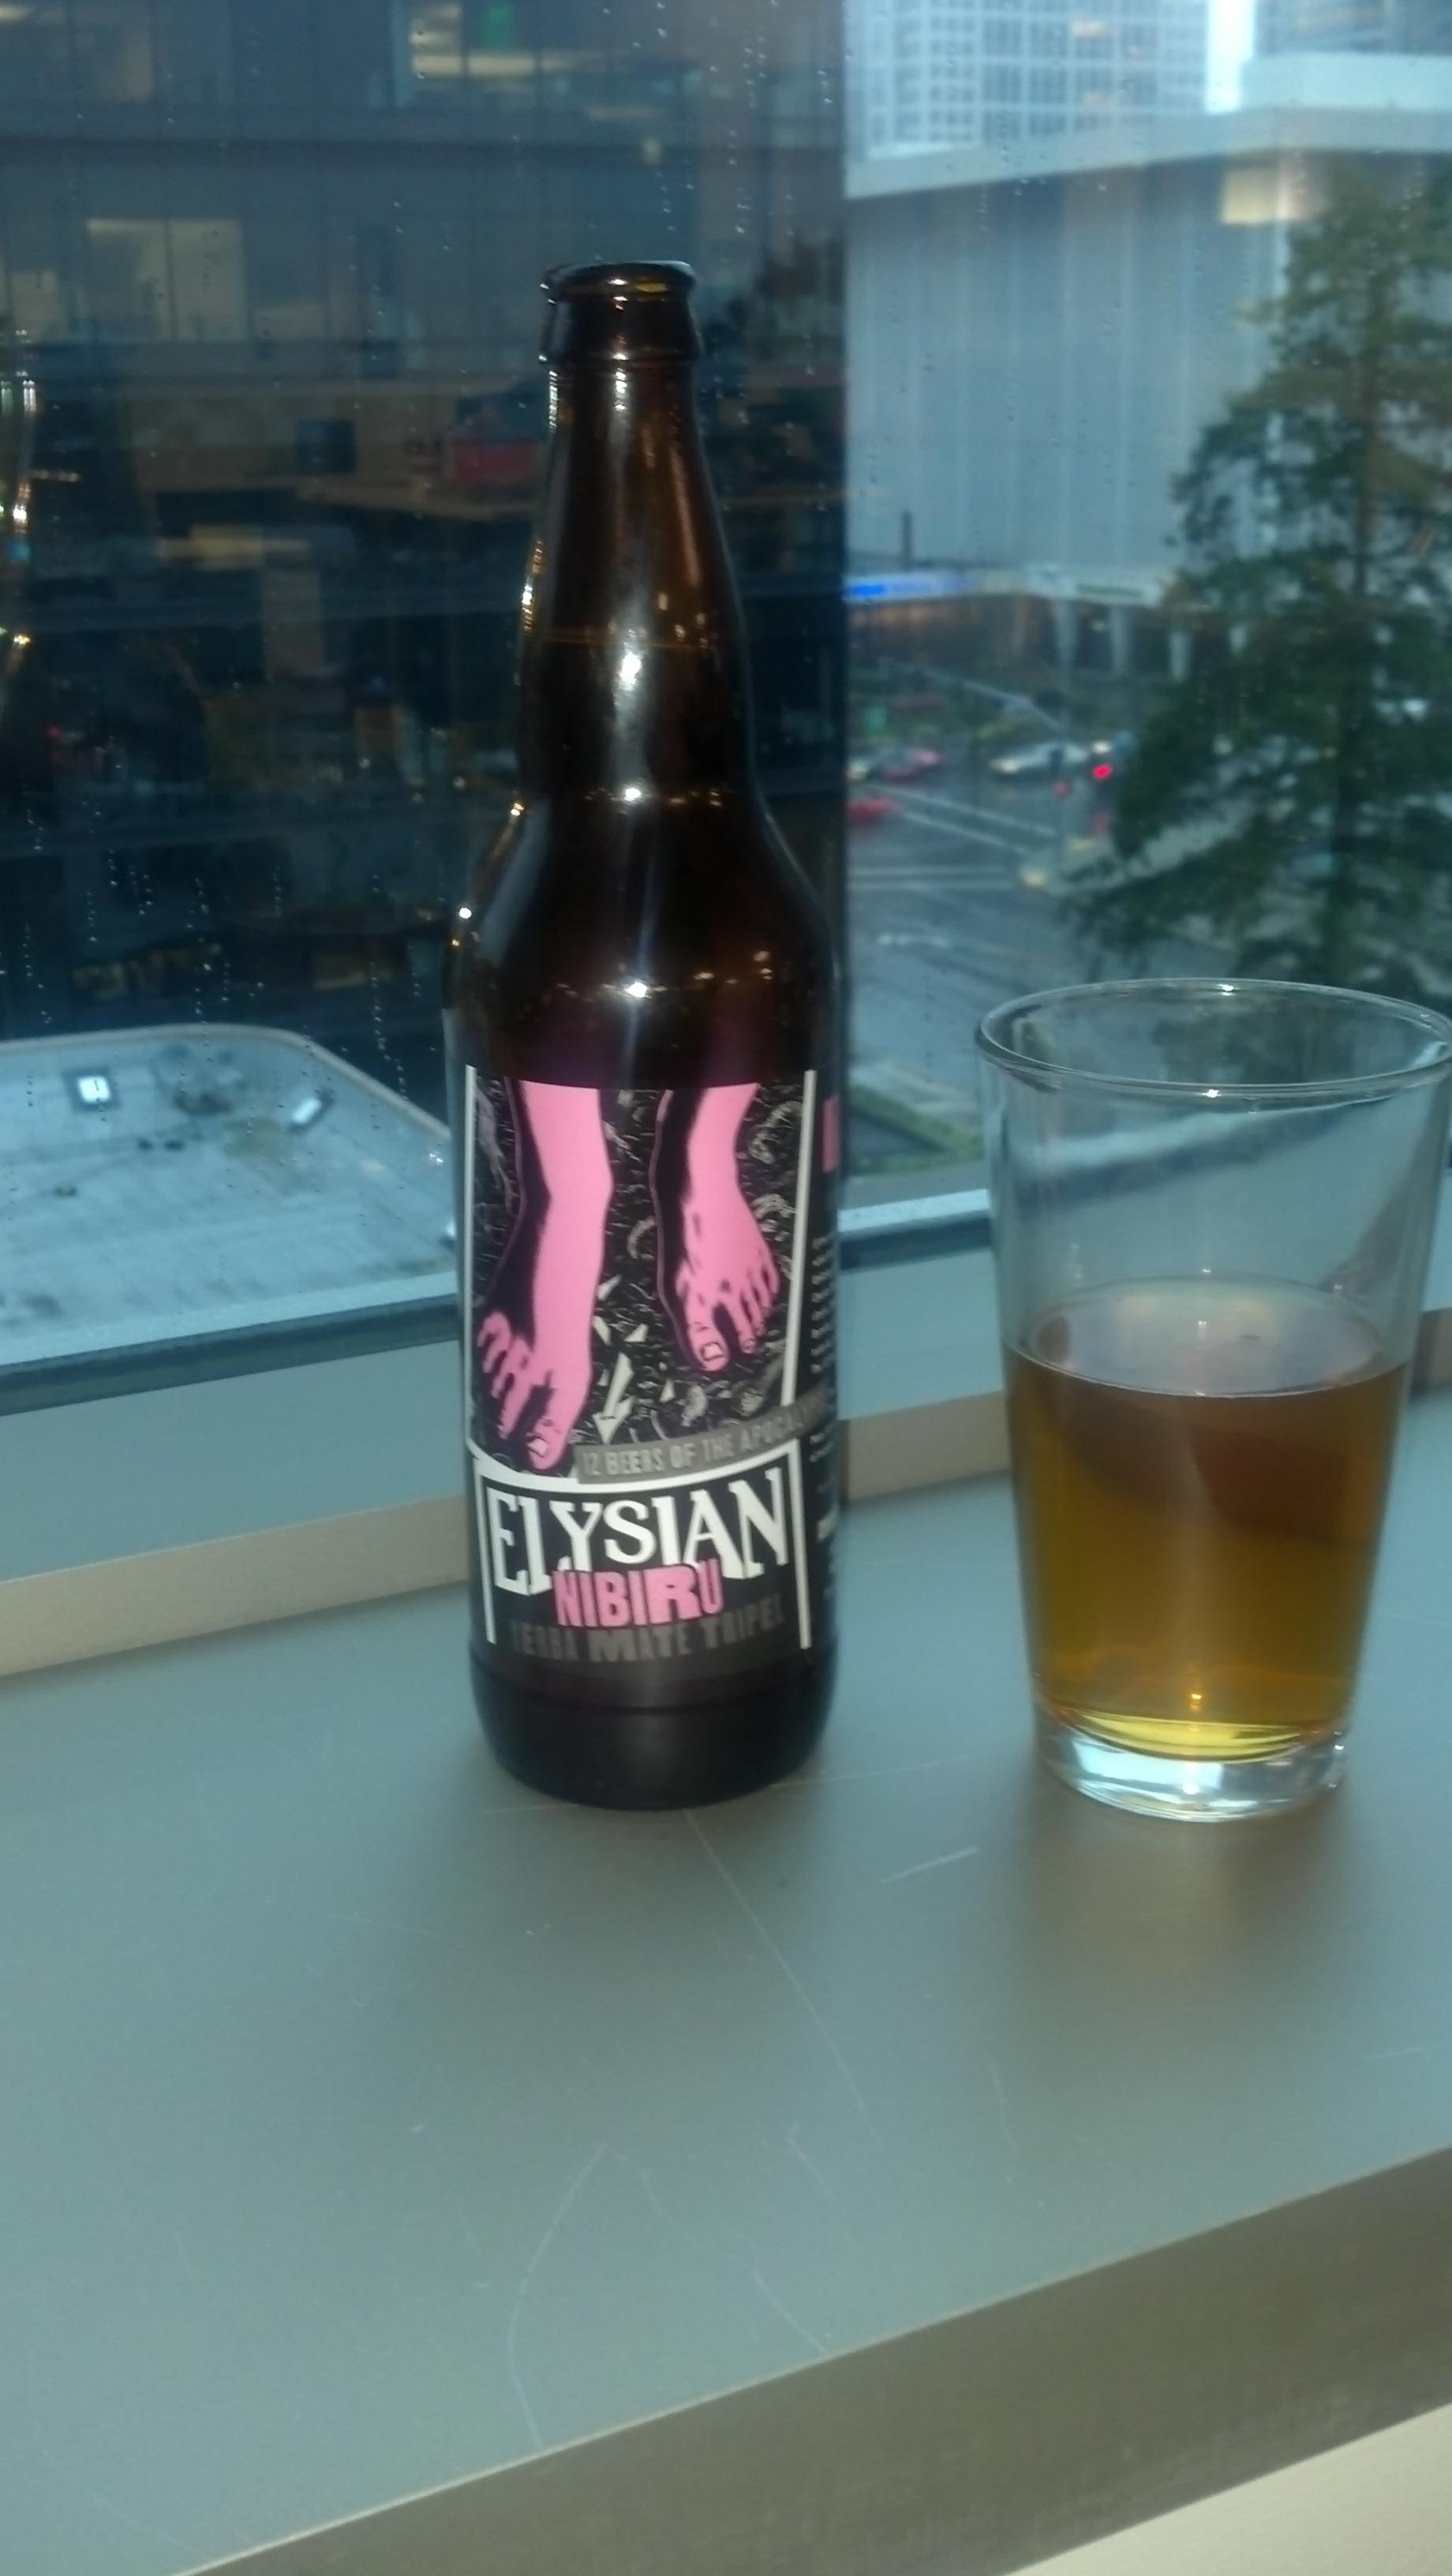 Elysian Brewing's Nibiru